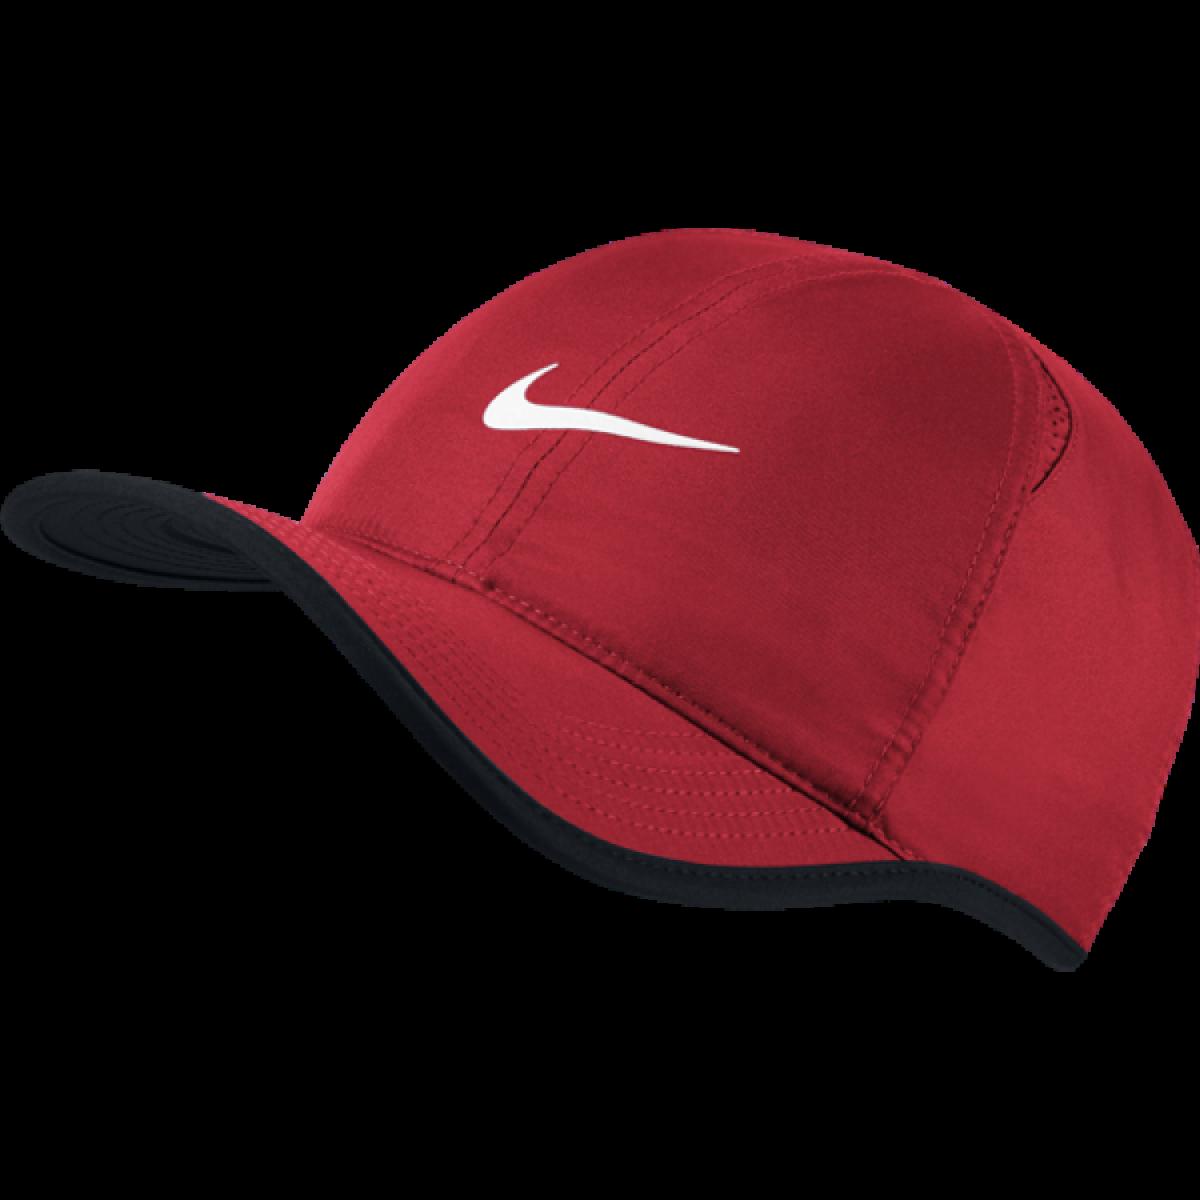 Boné Nike Feather Light Cap  dbf92c55673